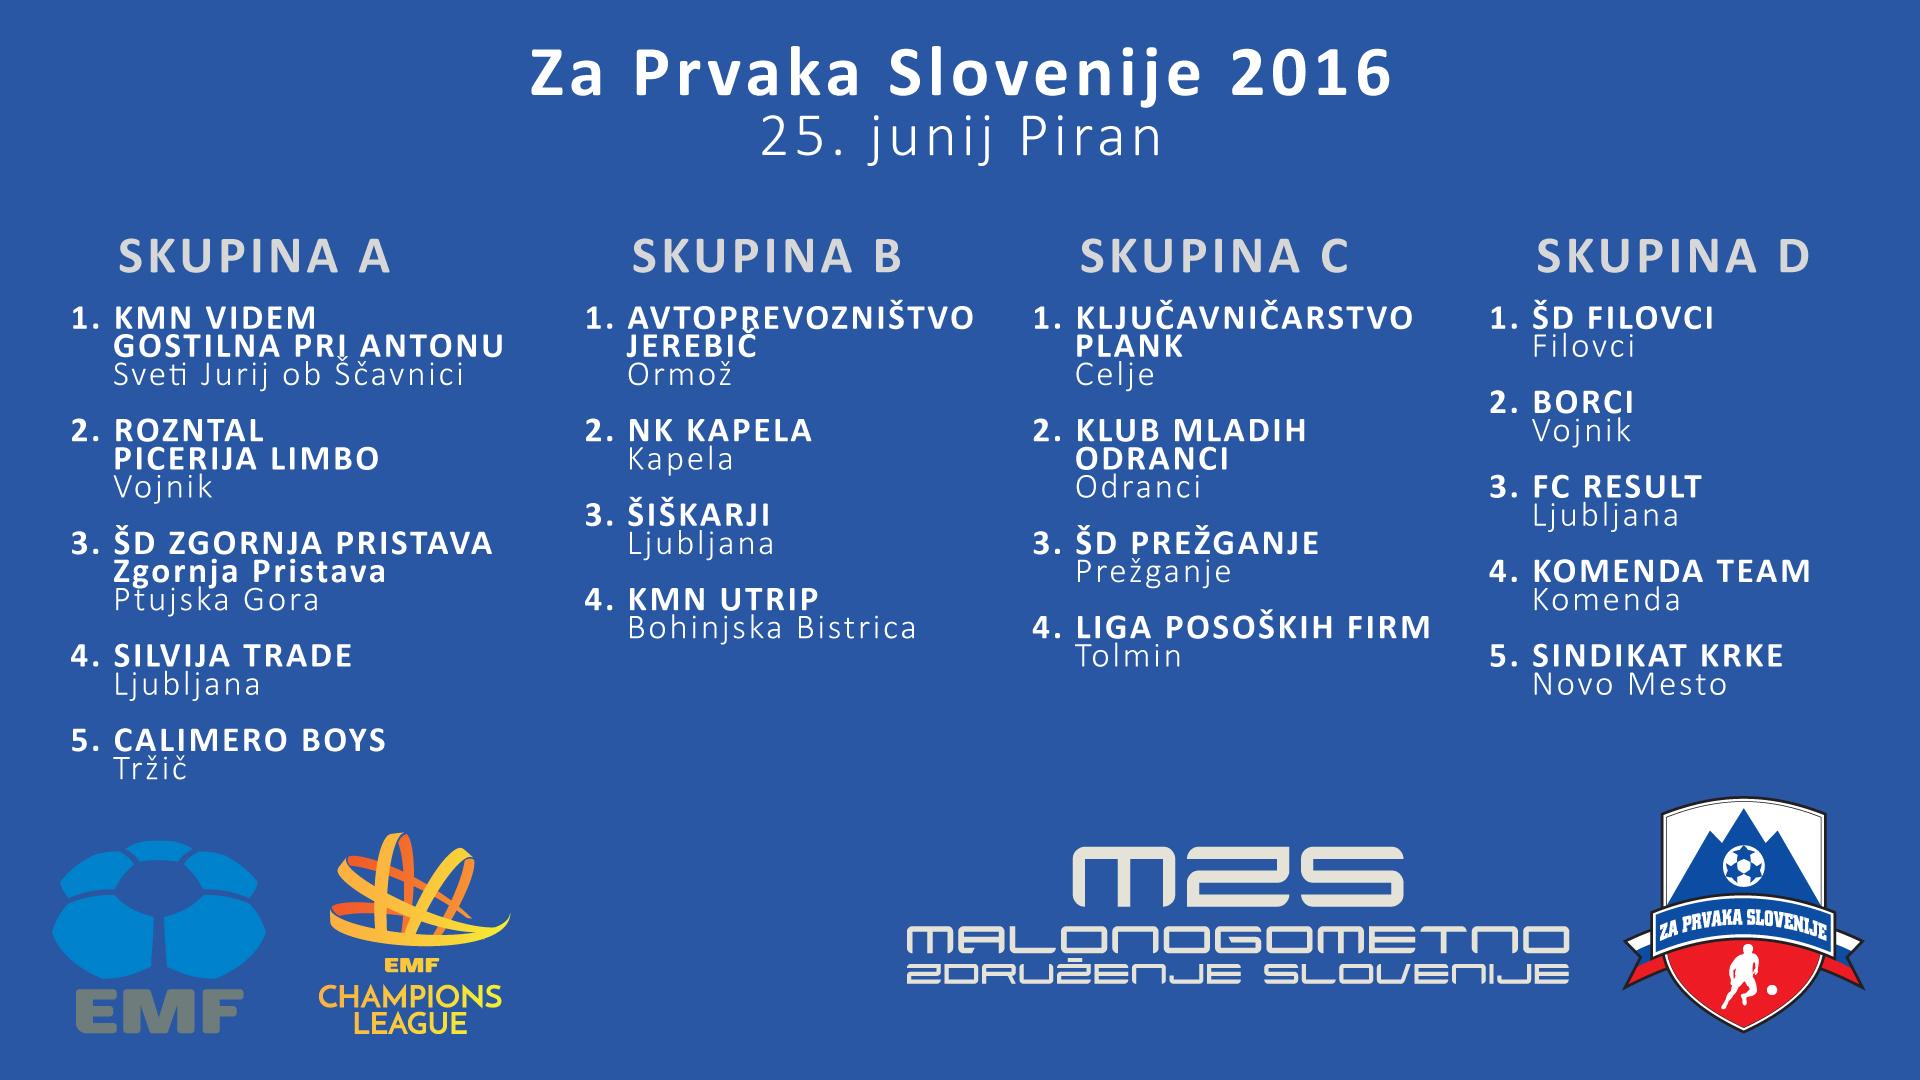 Izžrebane skupine Za Prvaka Slovenije 2016